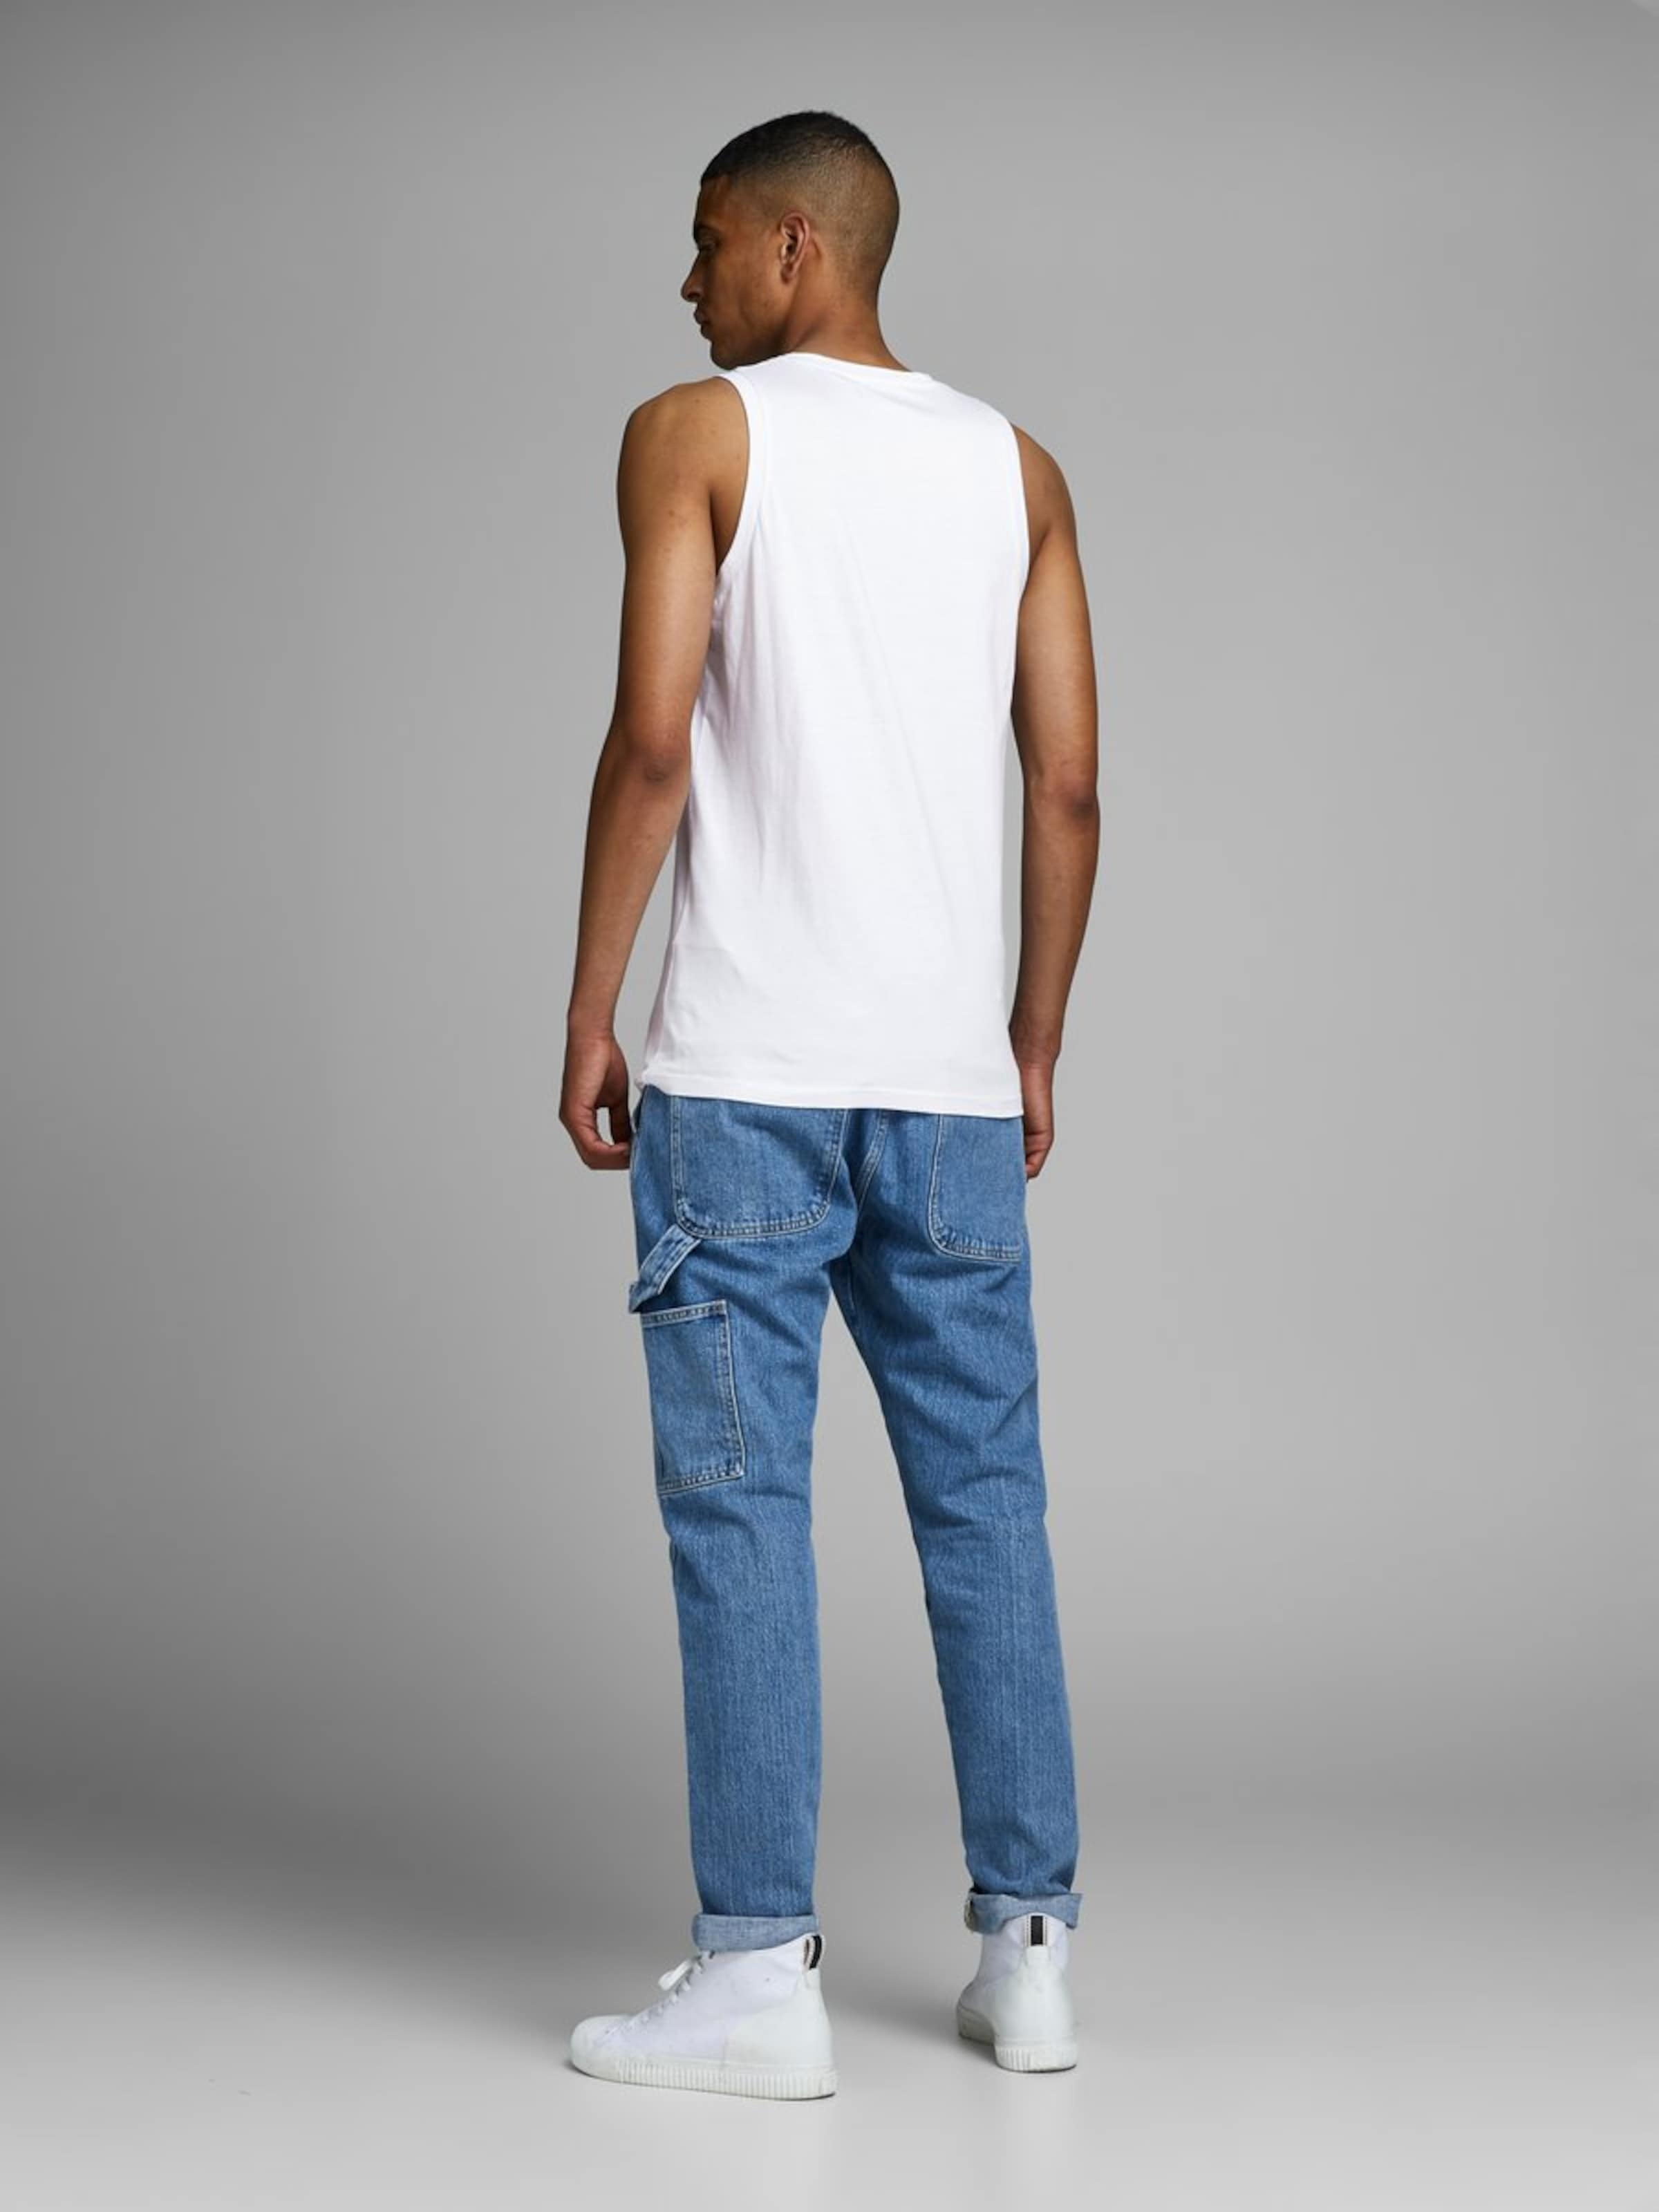 Jackamp; Noir Jones shirt T En dshrQCt